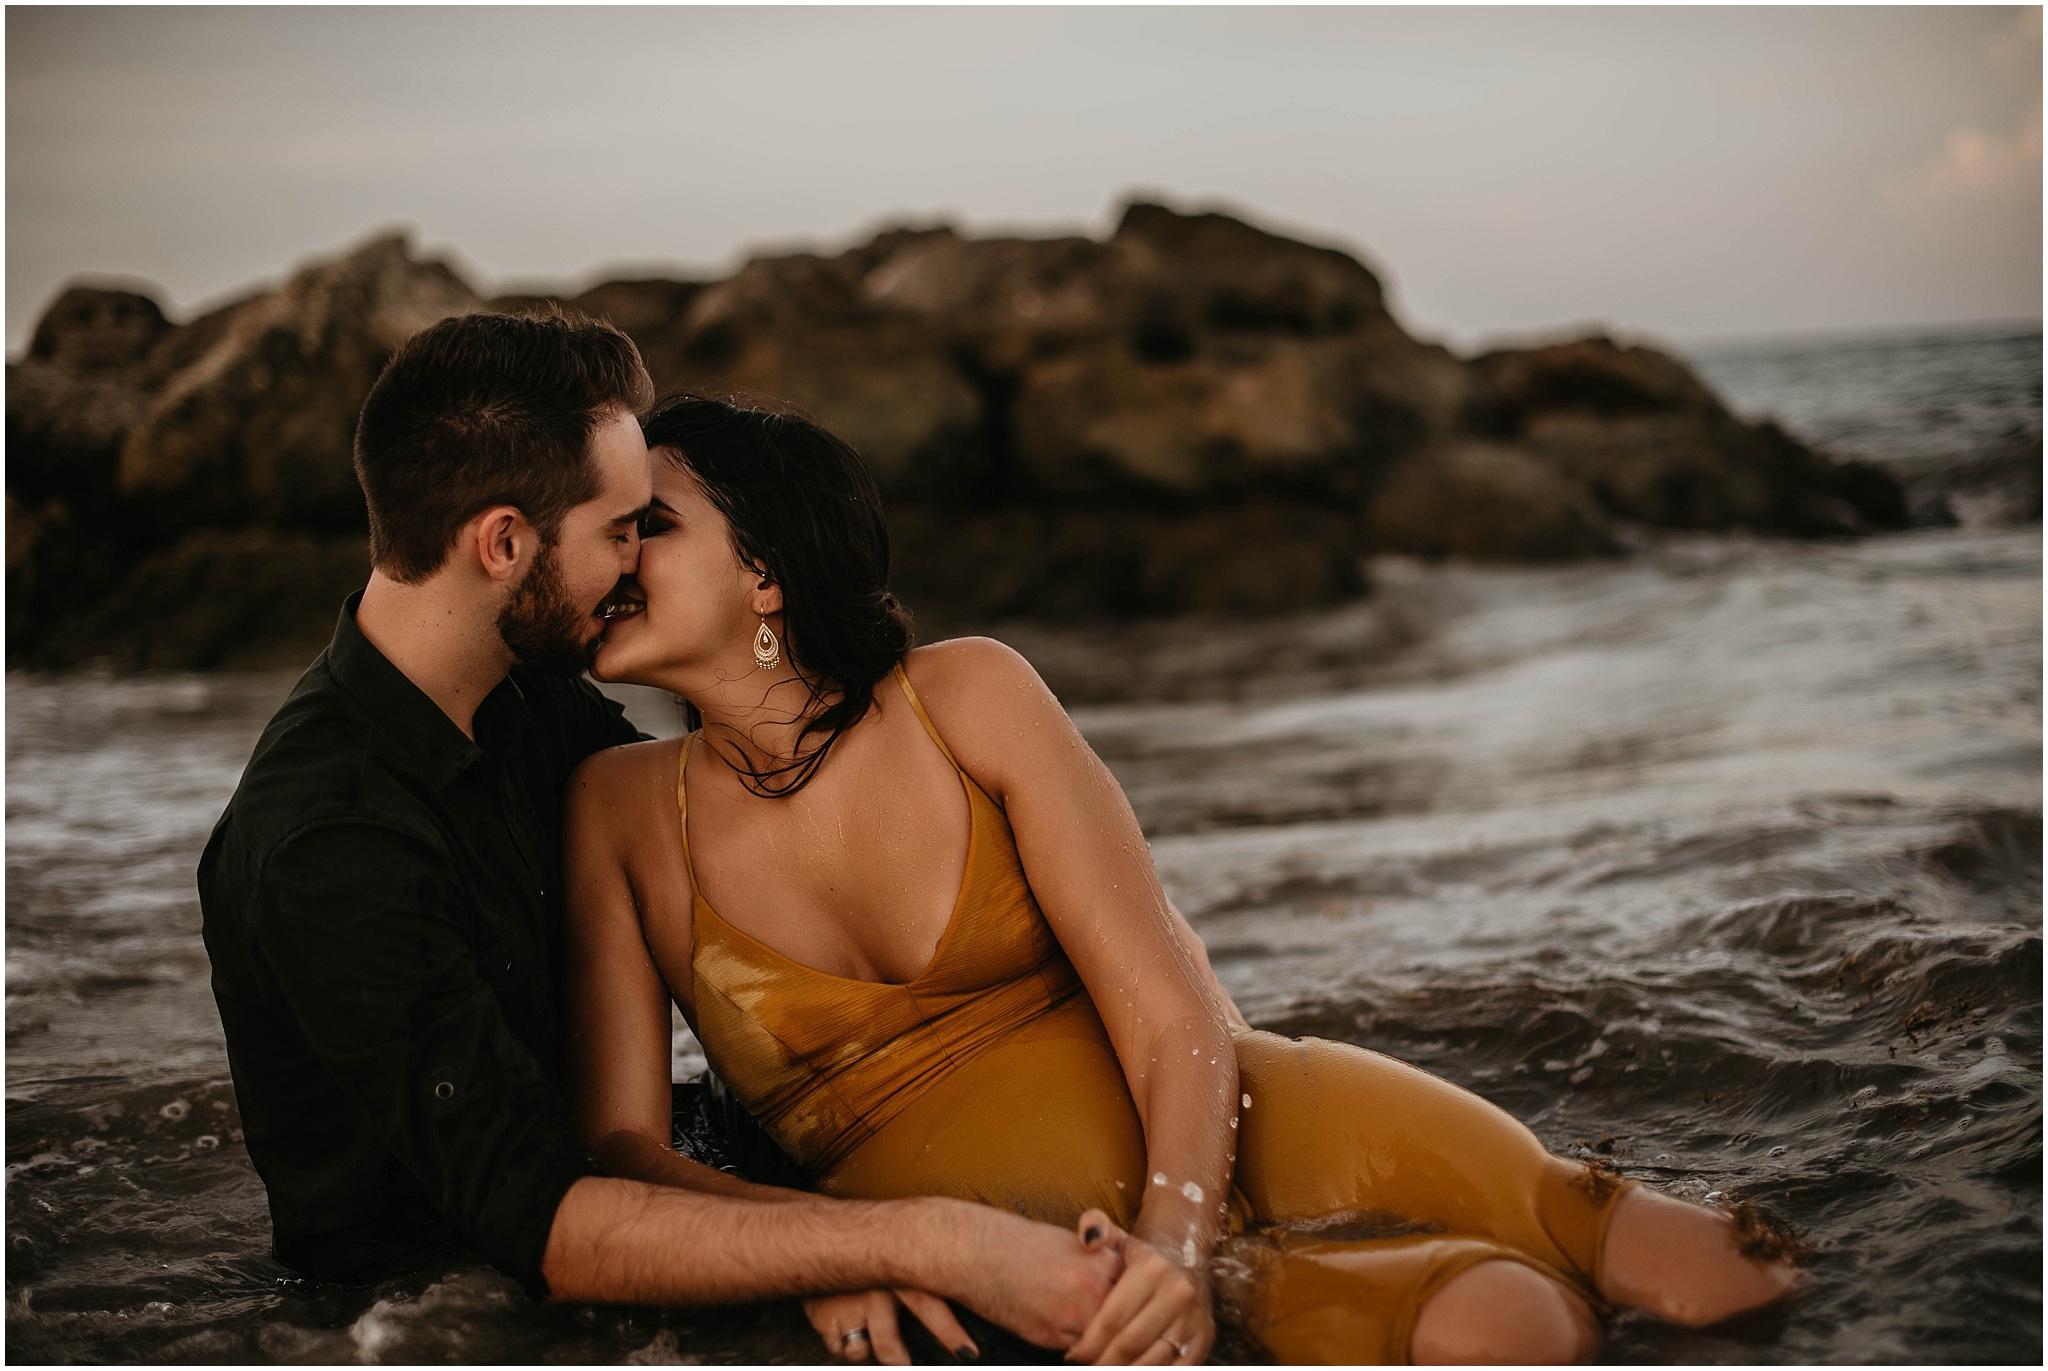 Worth-Avenue-Palm-Beach-engagement-photographer_0036.jpg